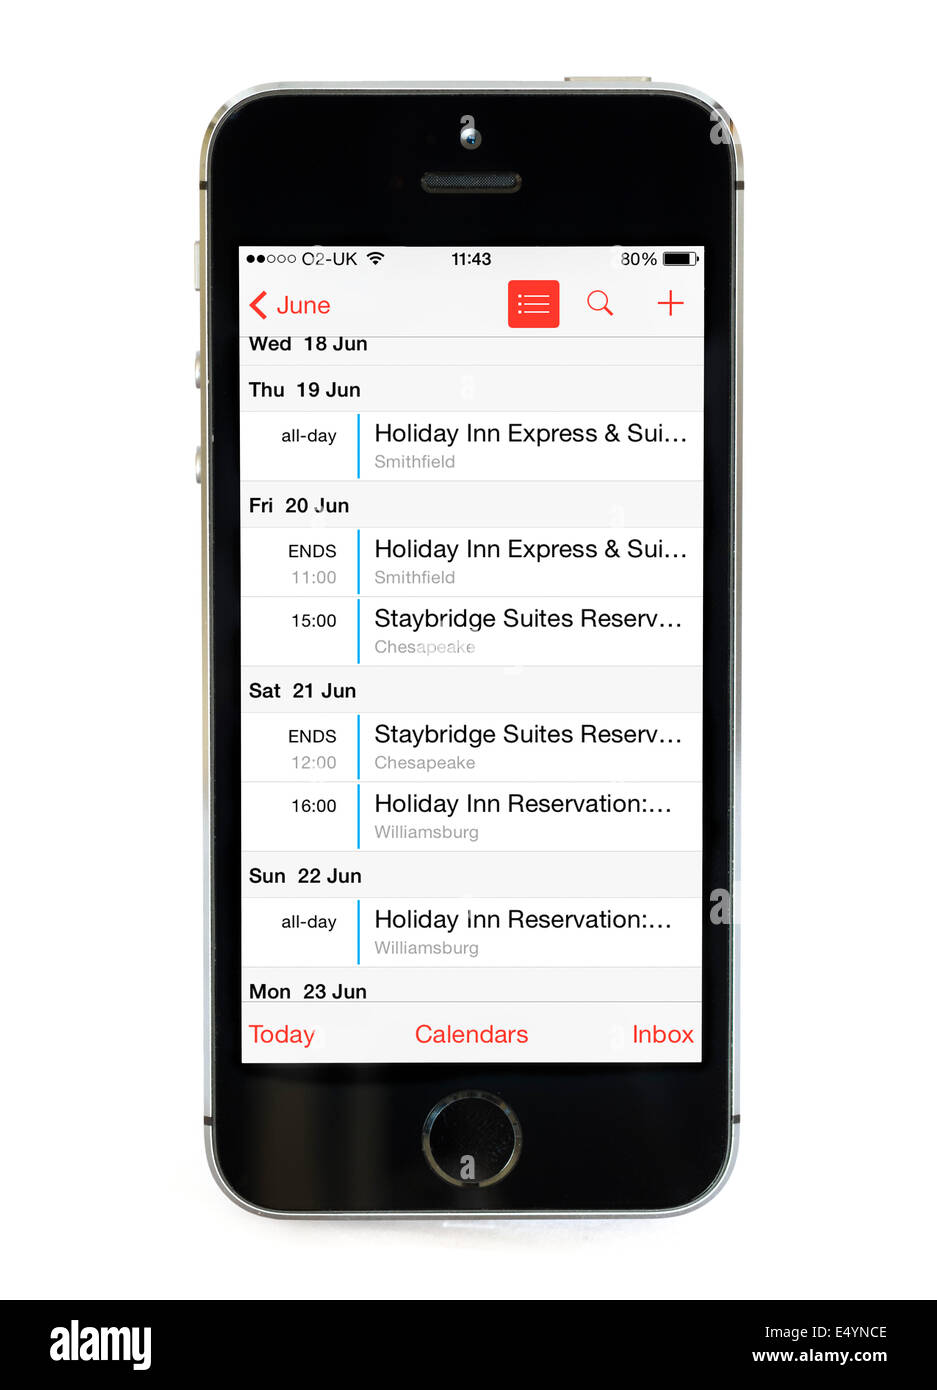 The Calendar app on an Apple iPhone 5S - Stock Image